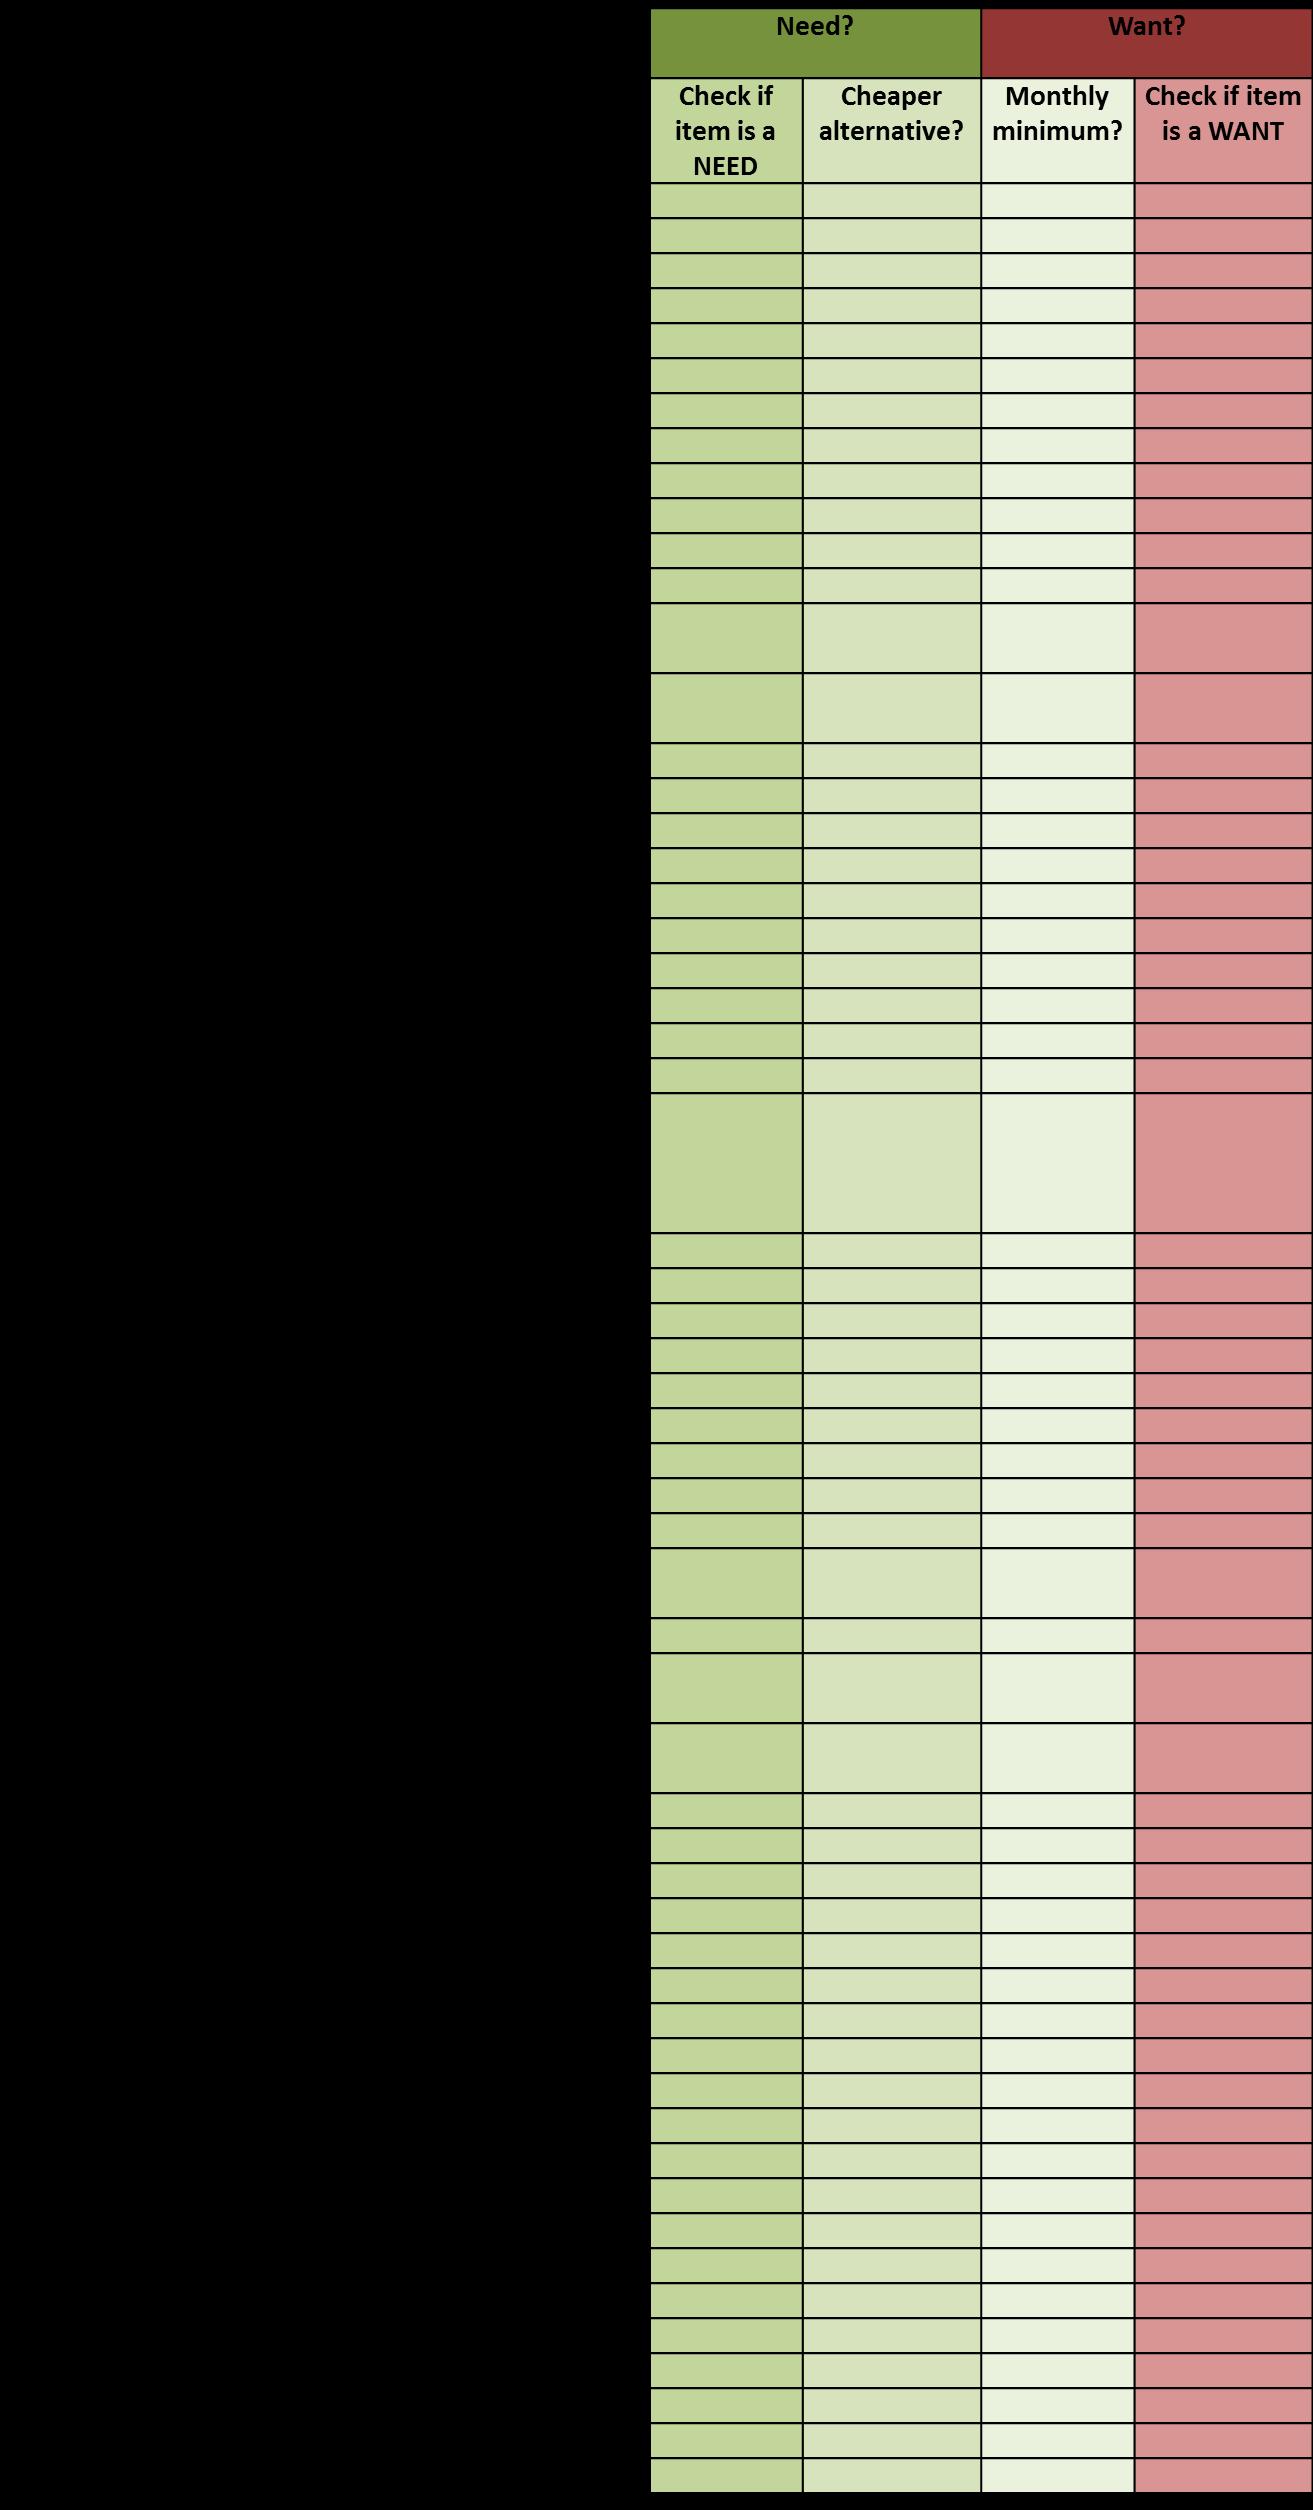 Image 7 Budgeting money, Money chart, Budgeting finances